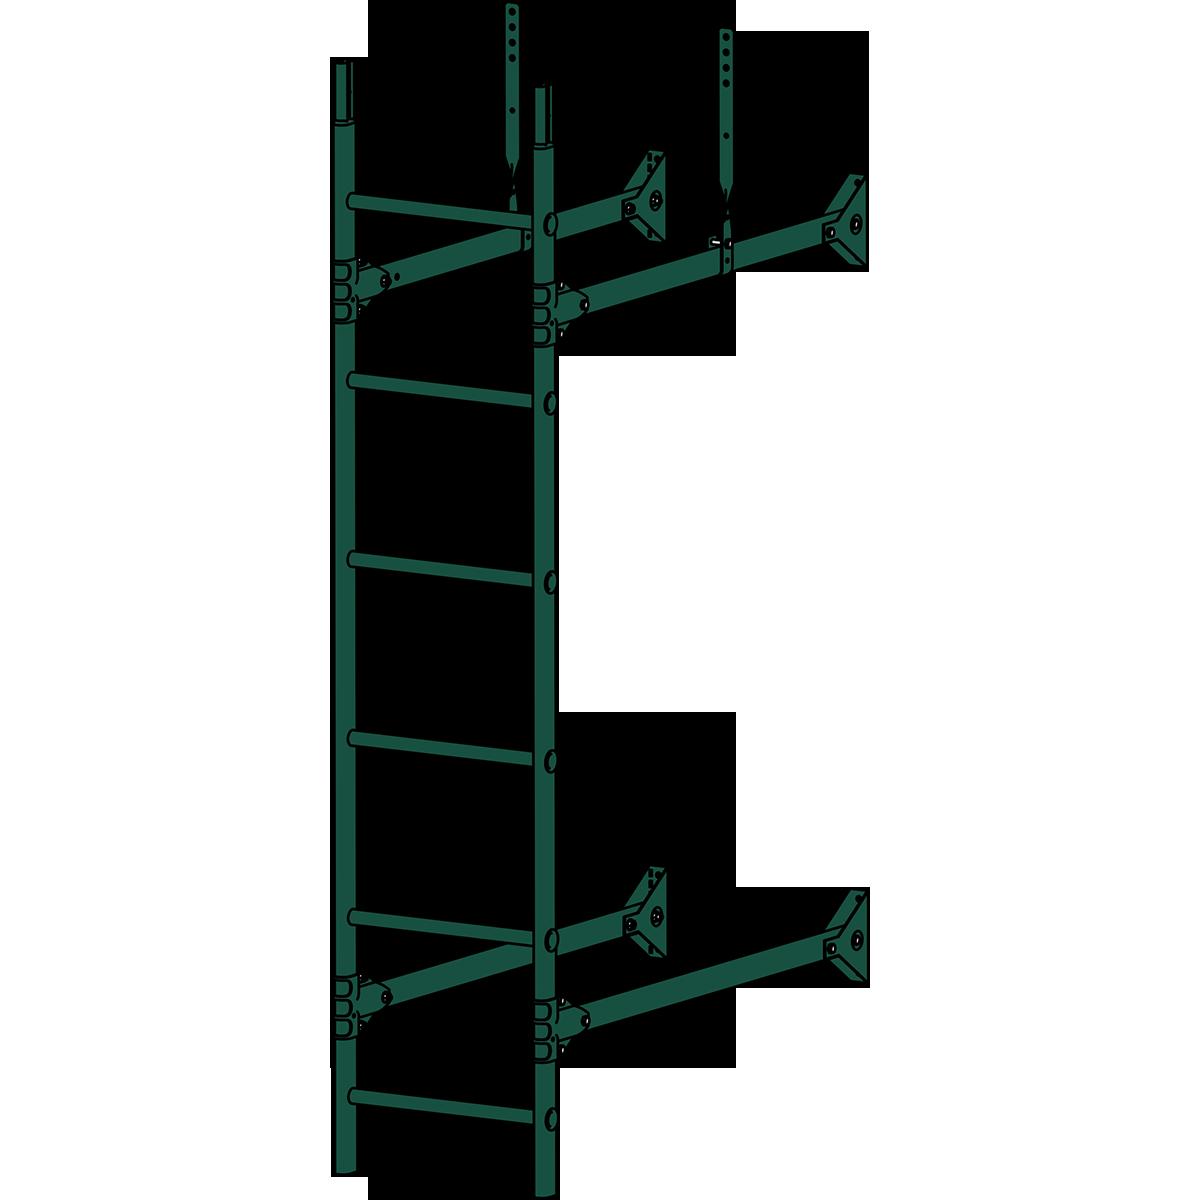 Лестница стеновая ROOFSYSTEMS PRESTIGE ZN 1,2 м RAL 6005 Зеленый мох